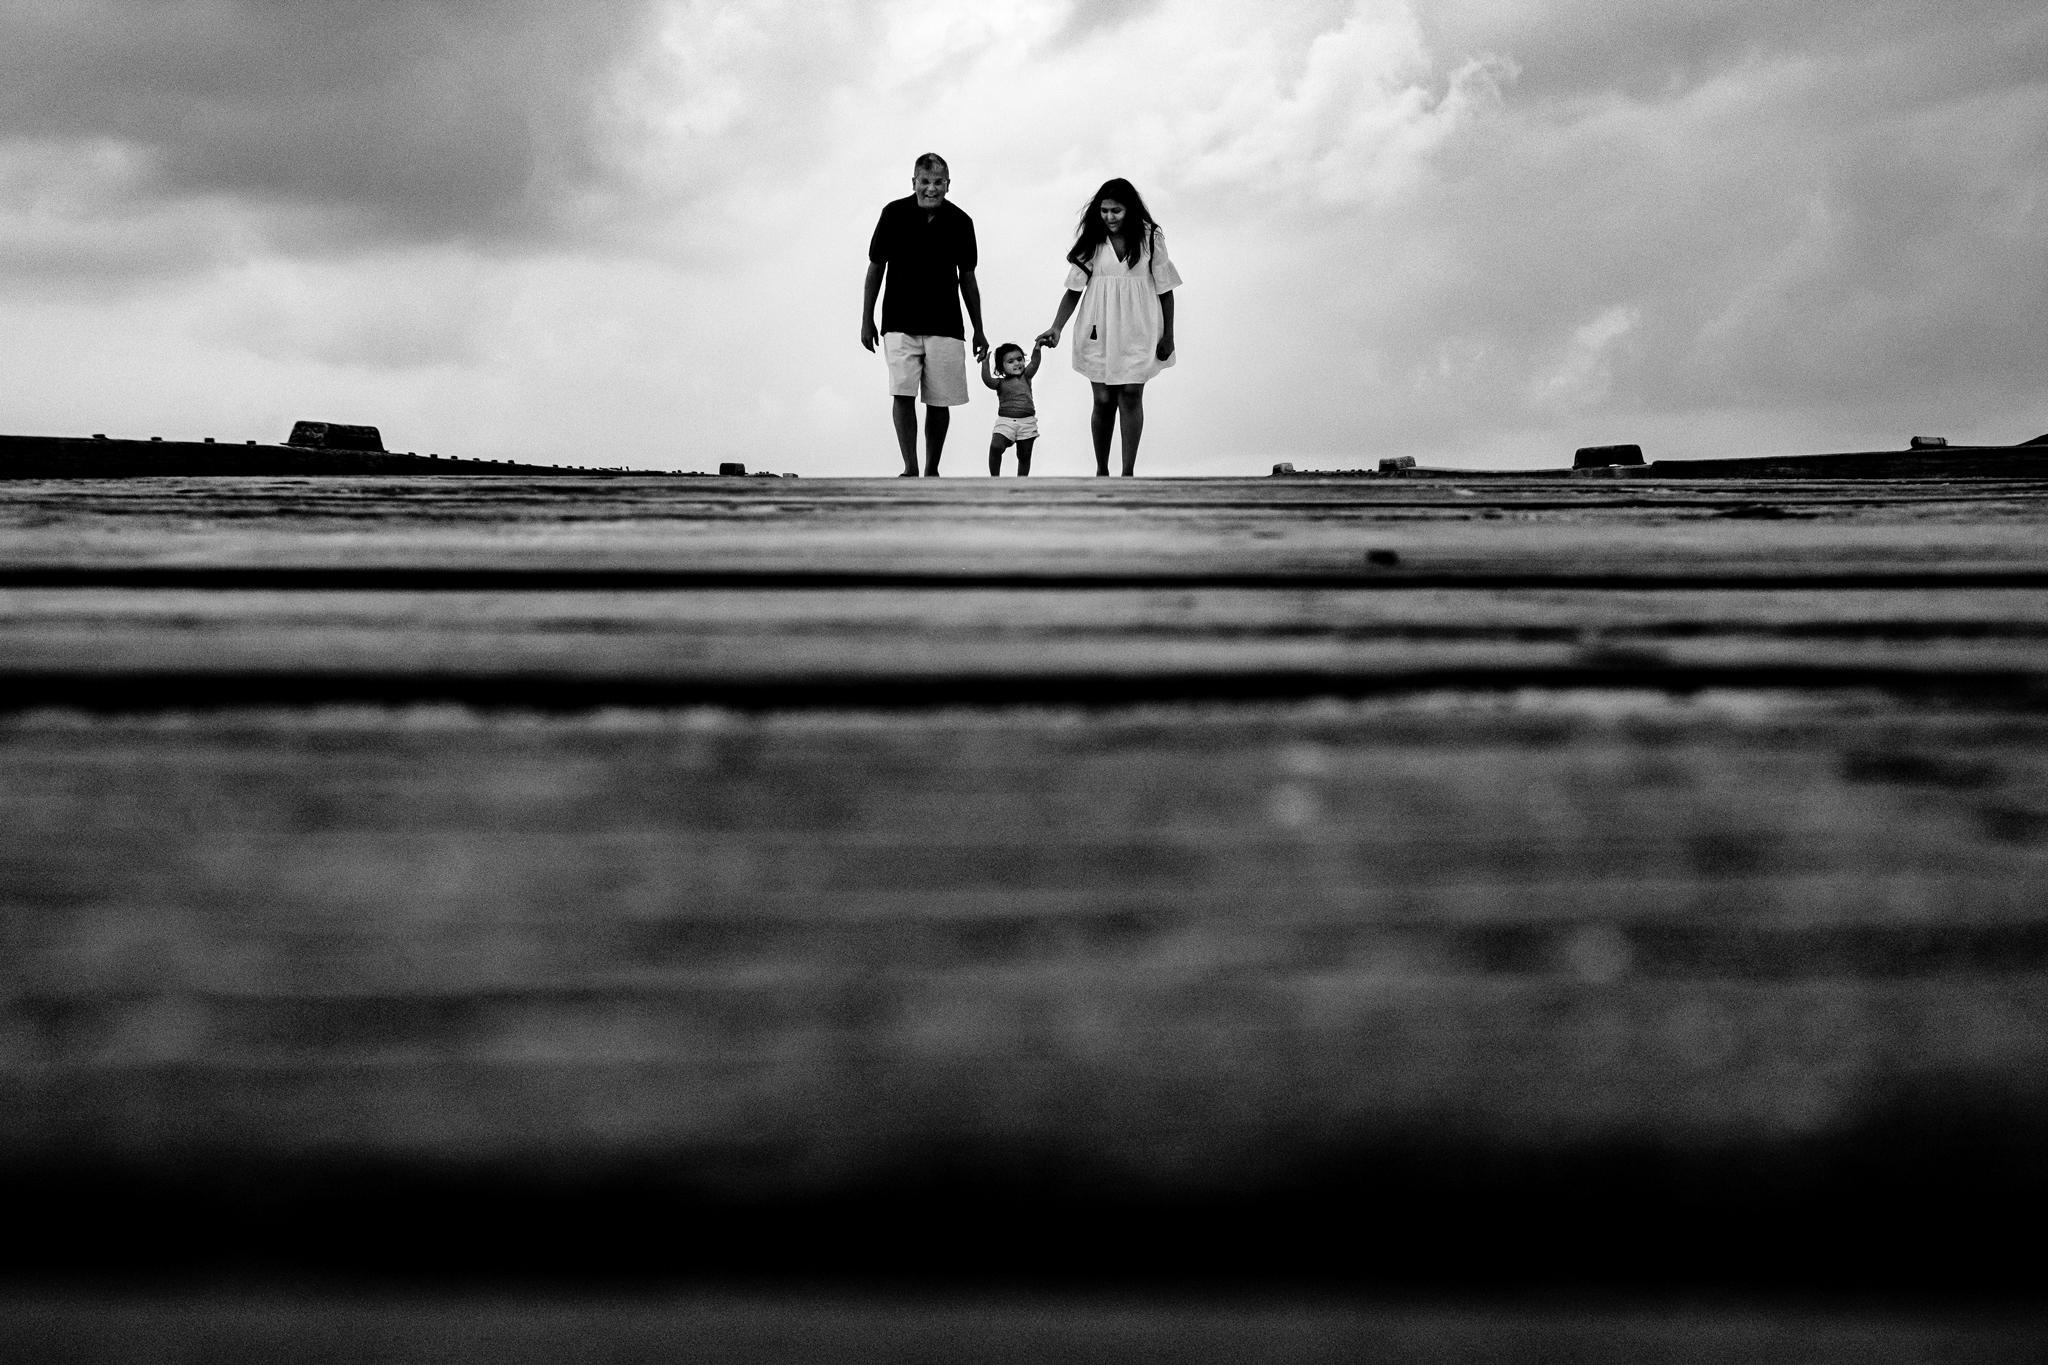 Aira-Walking.jpg